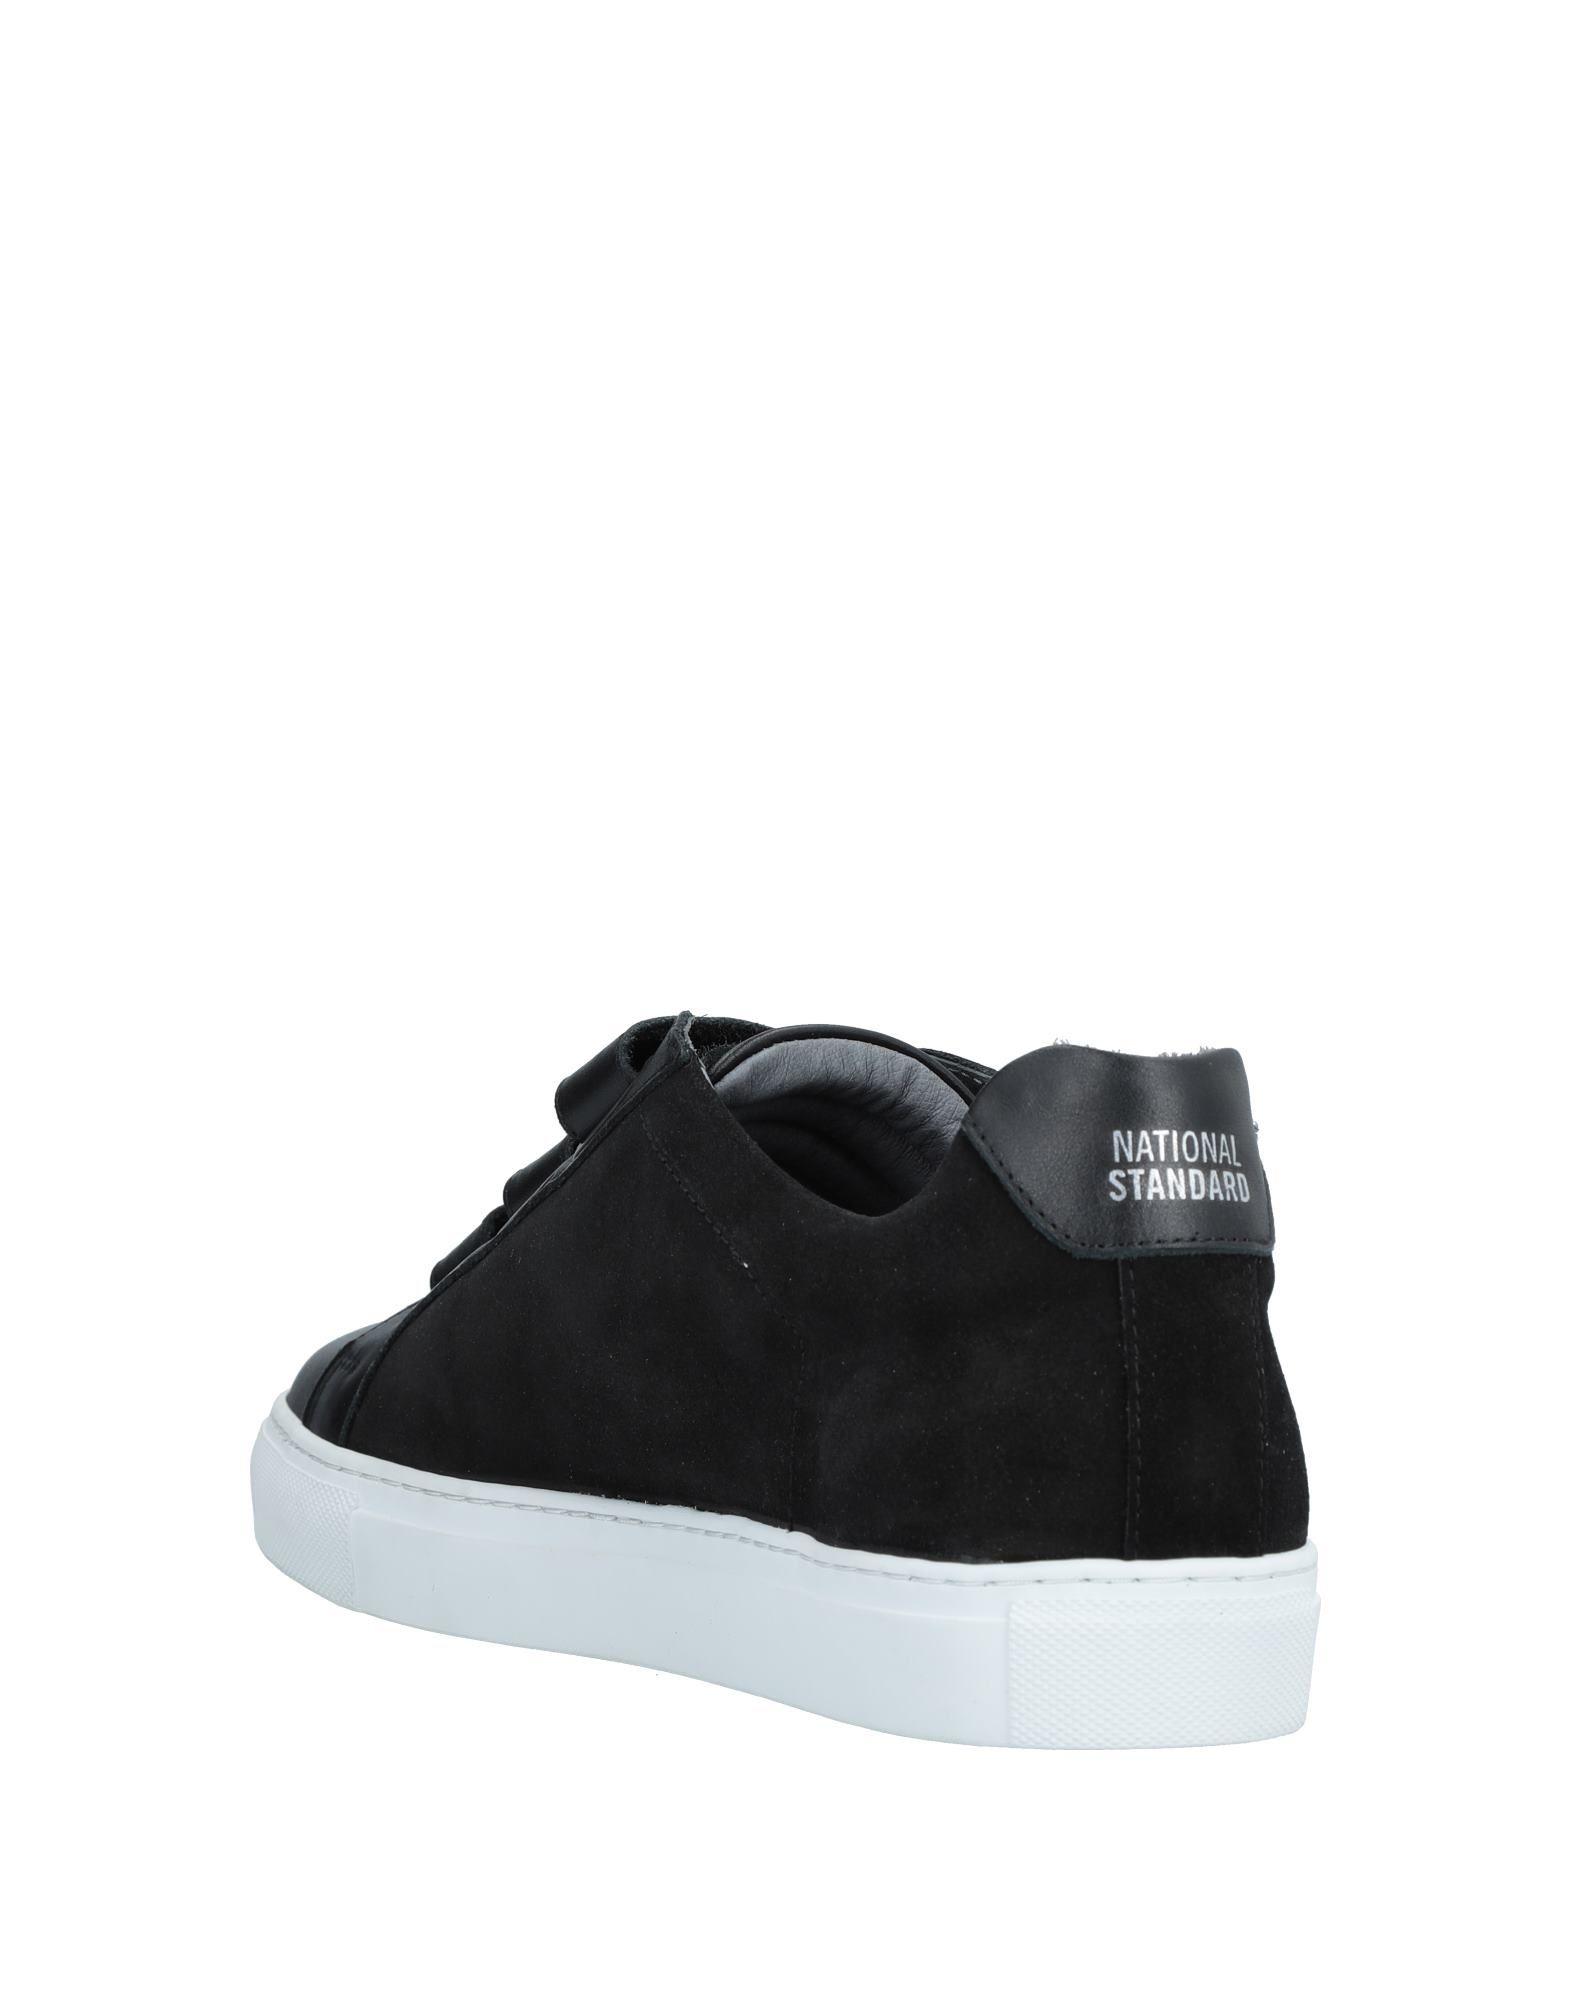 National Standard Sneakers Sneakers Standard Herren  11535868FS Neue Schuhe ce432f